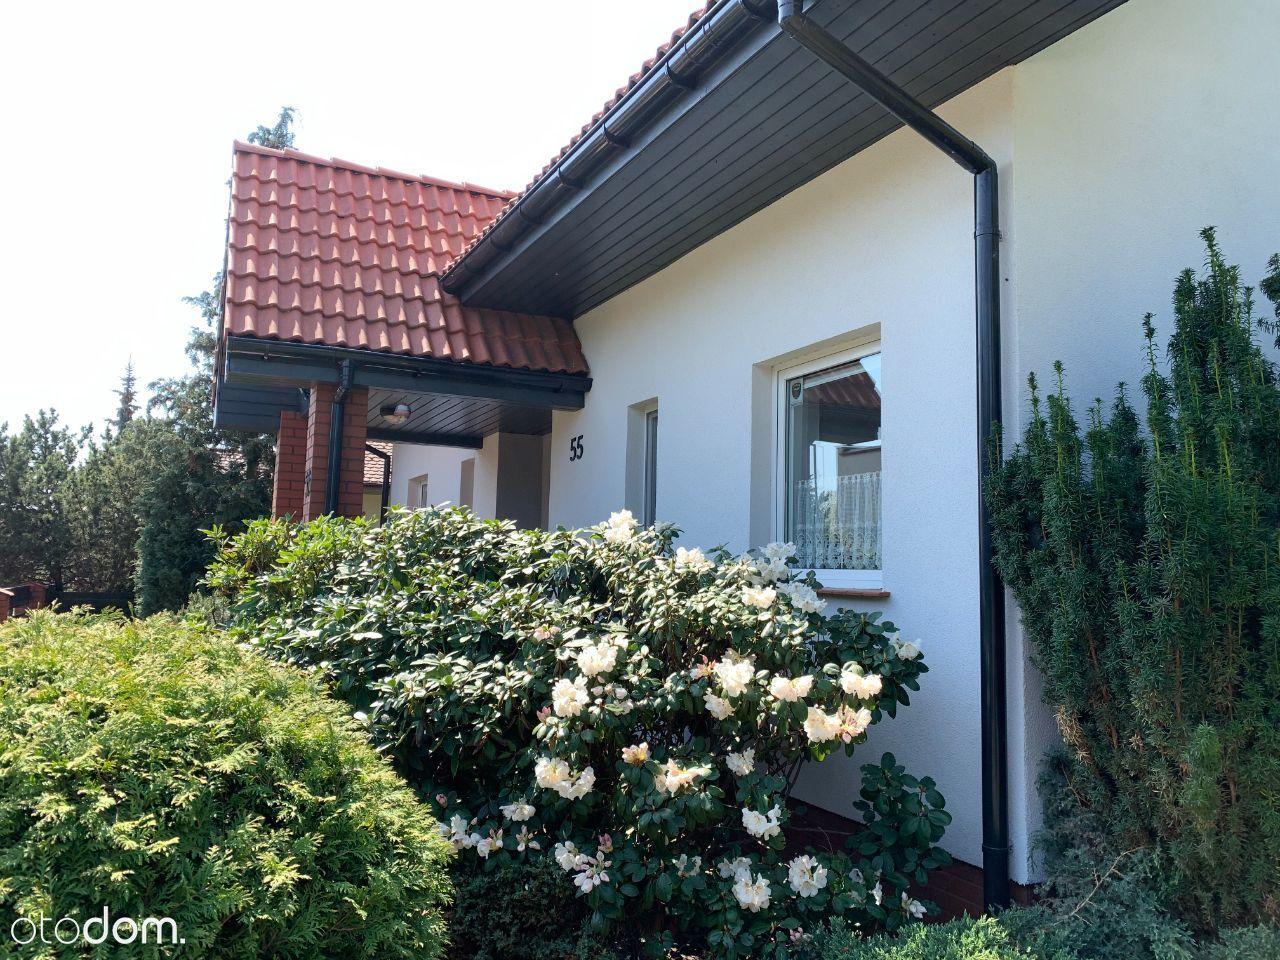 Dom w zieleni - miasto i natura